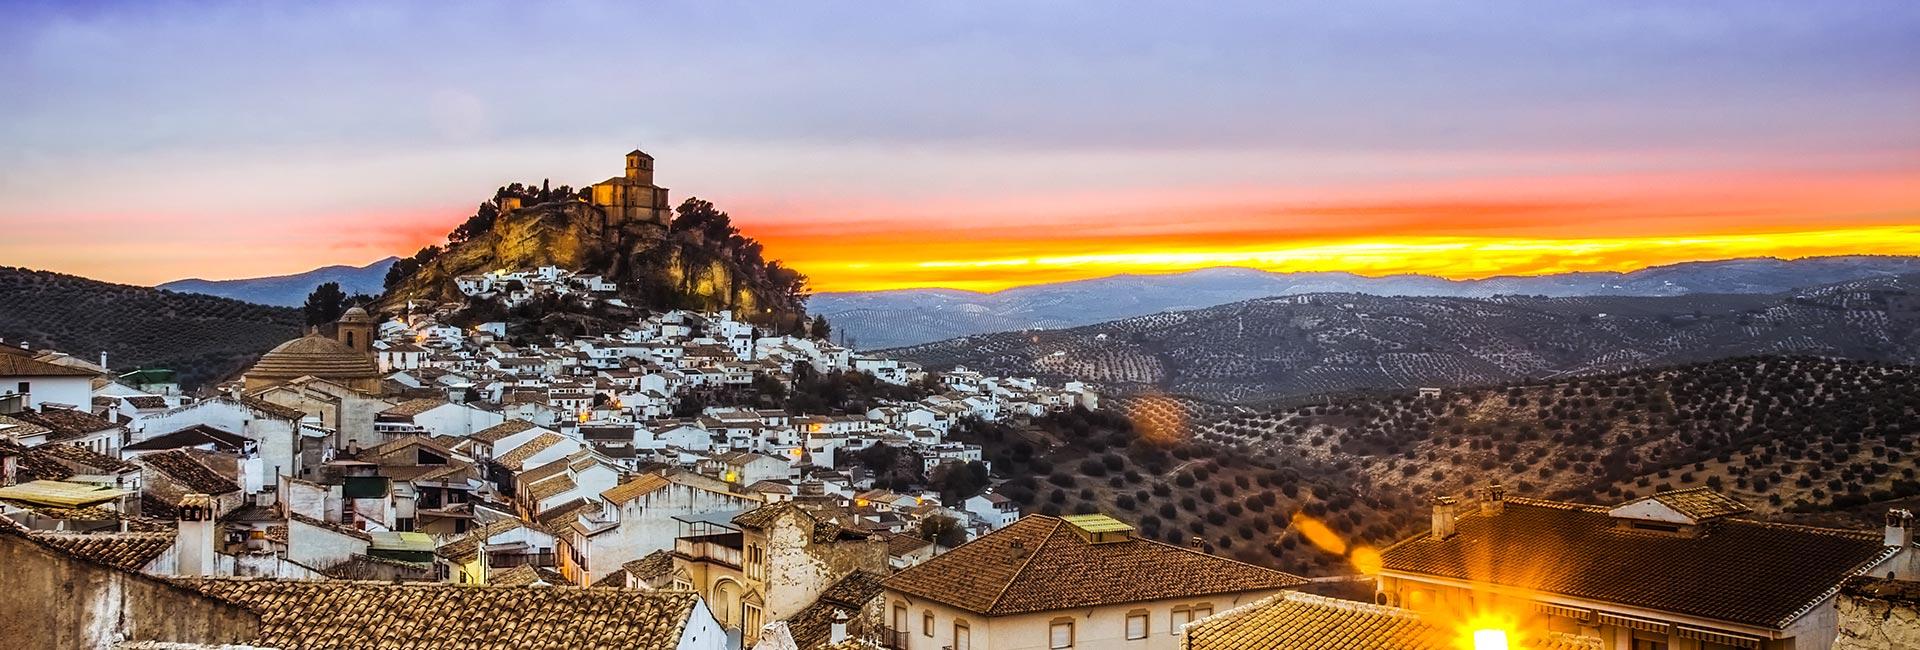 Granada Apartments Header Image